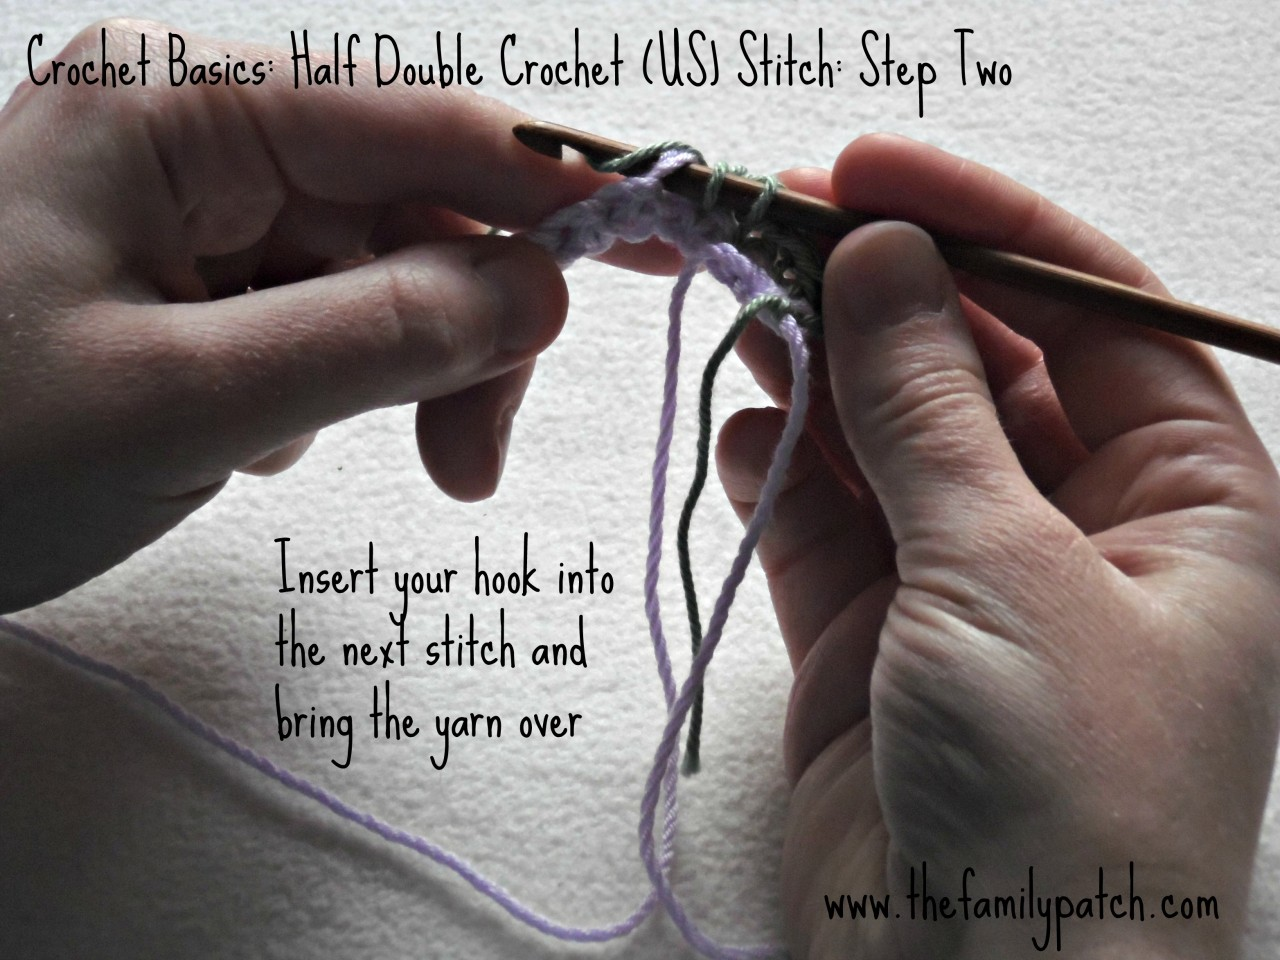 Crochet Basics Half Double Crochet Stitch Photo Tutorial